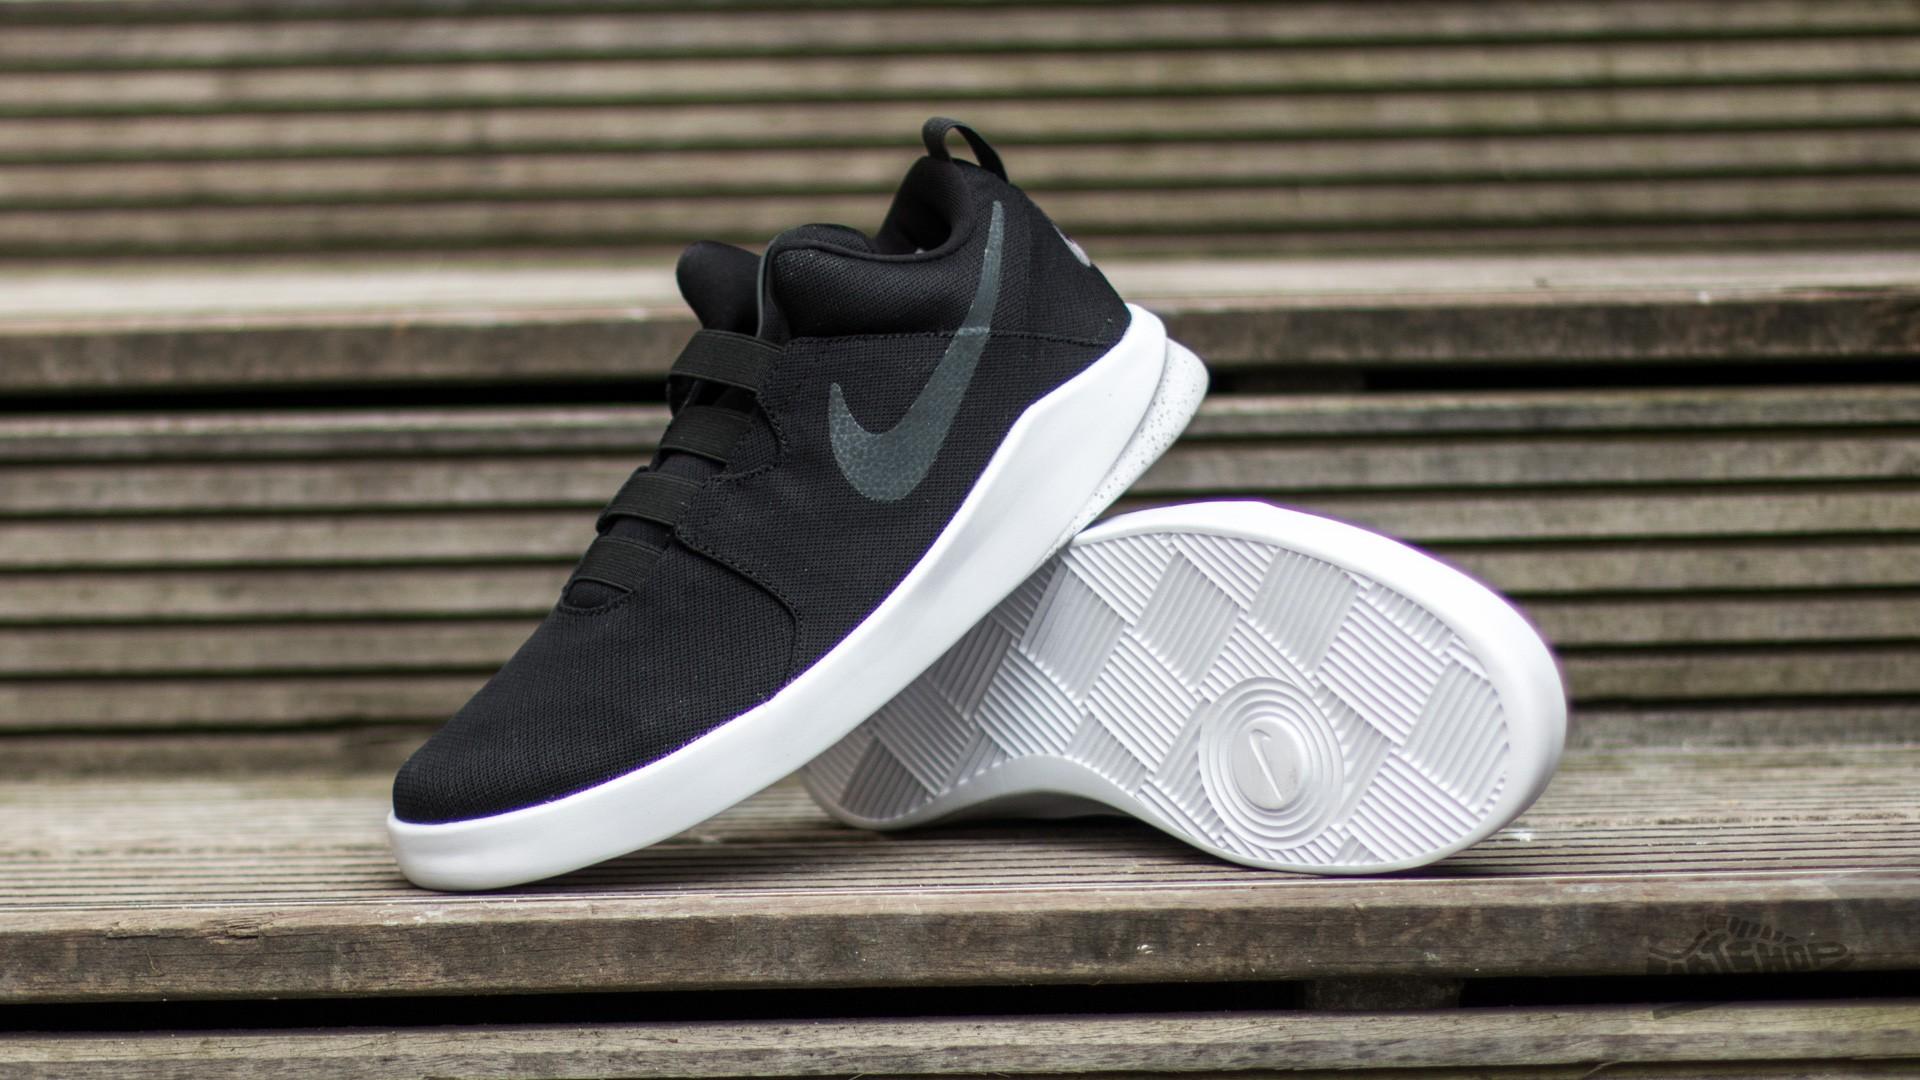 Mirar fijamente compromiso escalada  Men's shoes Nike Air Shibusa Black/ Anthracite-White | Footshop